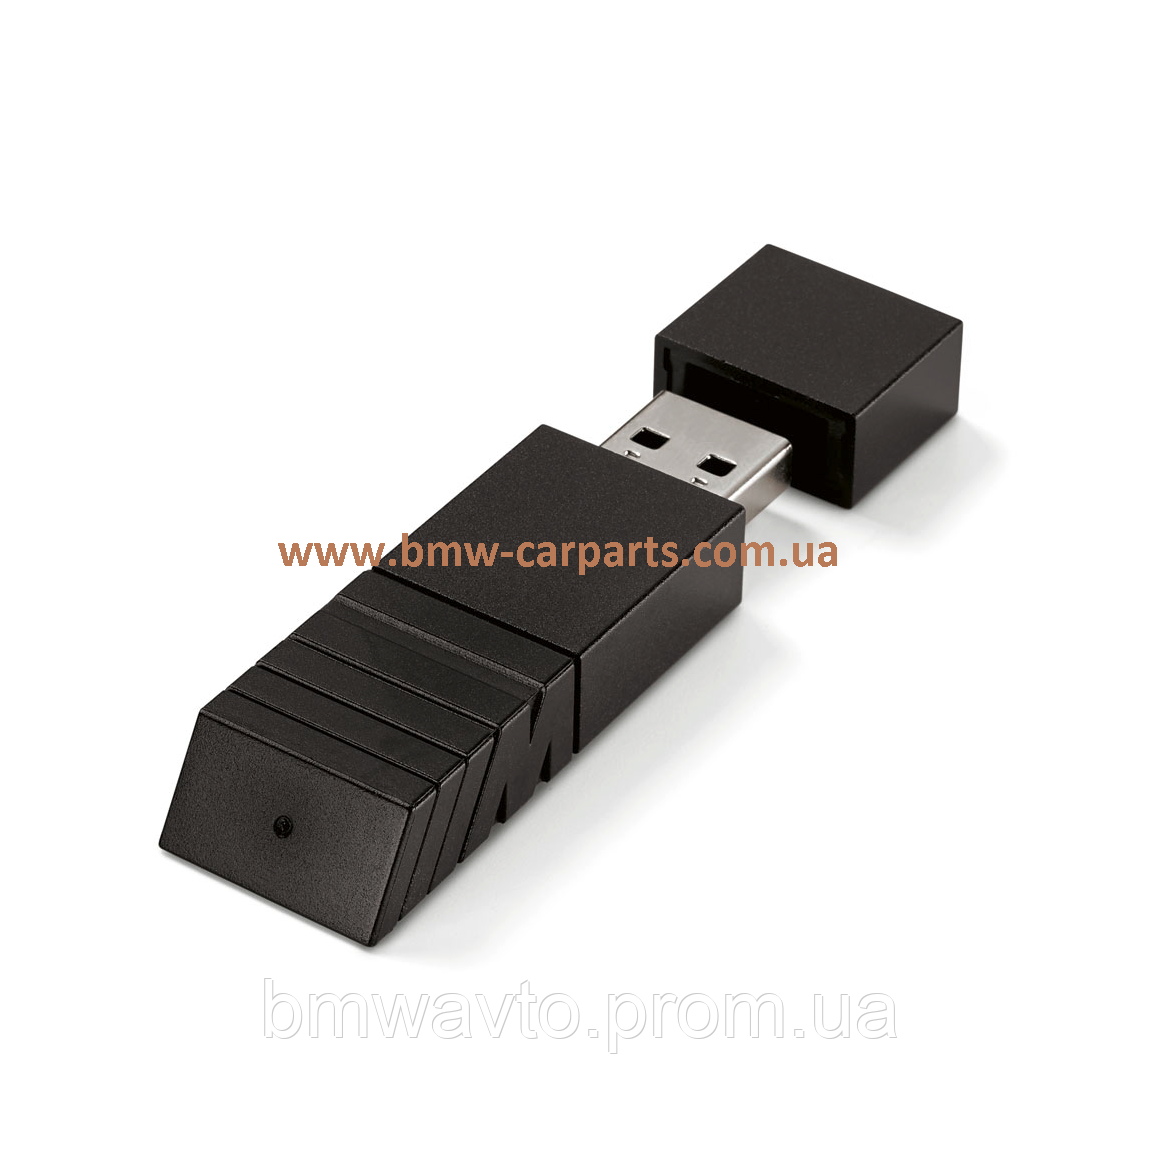 Флешка BMW M USB 3.0 Stick 64 GB 2018